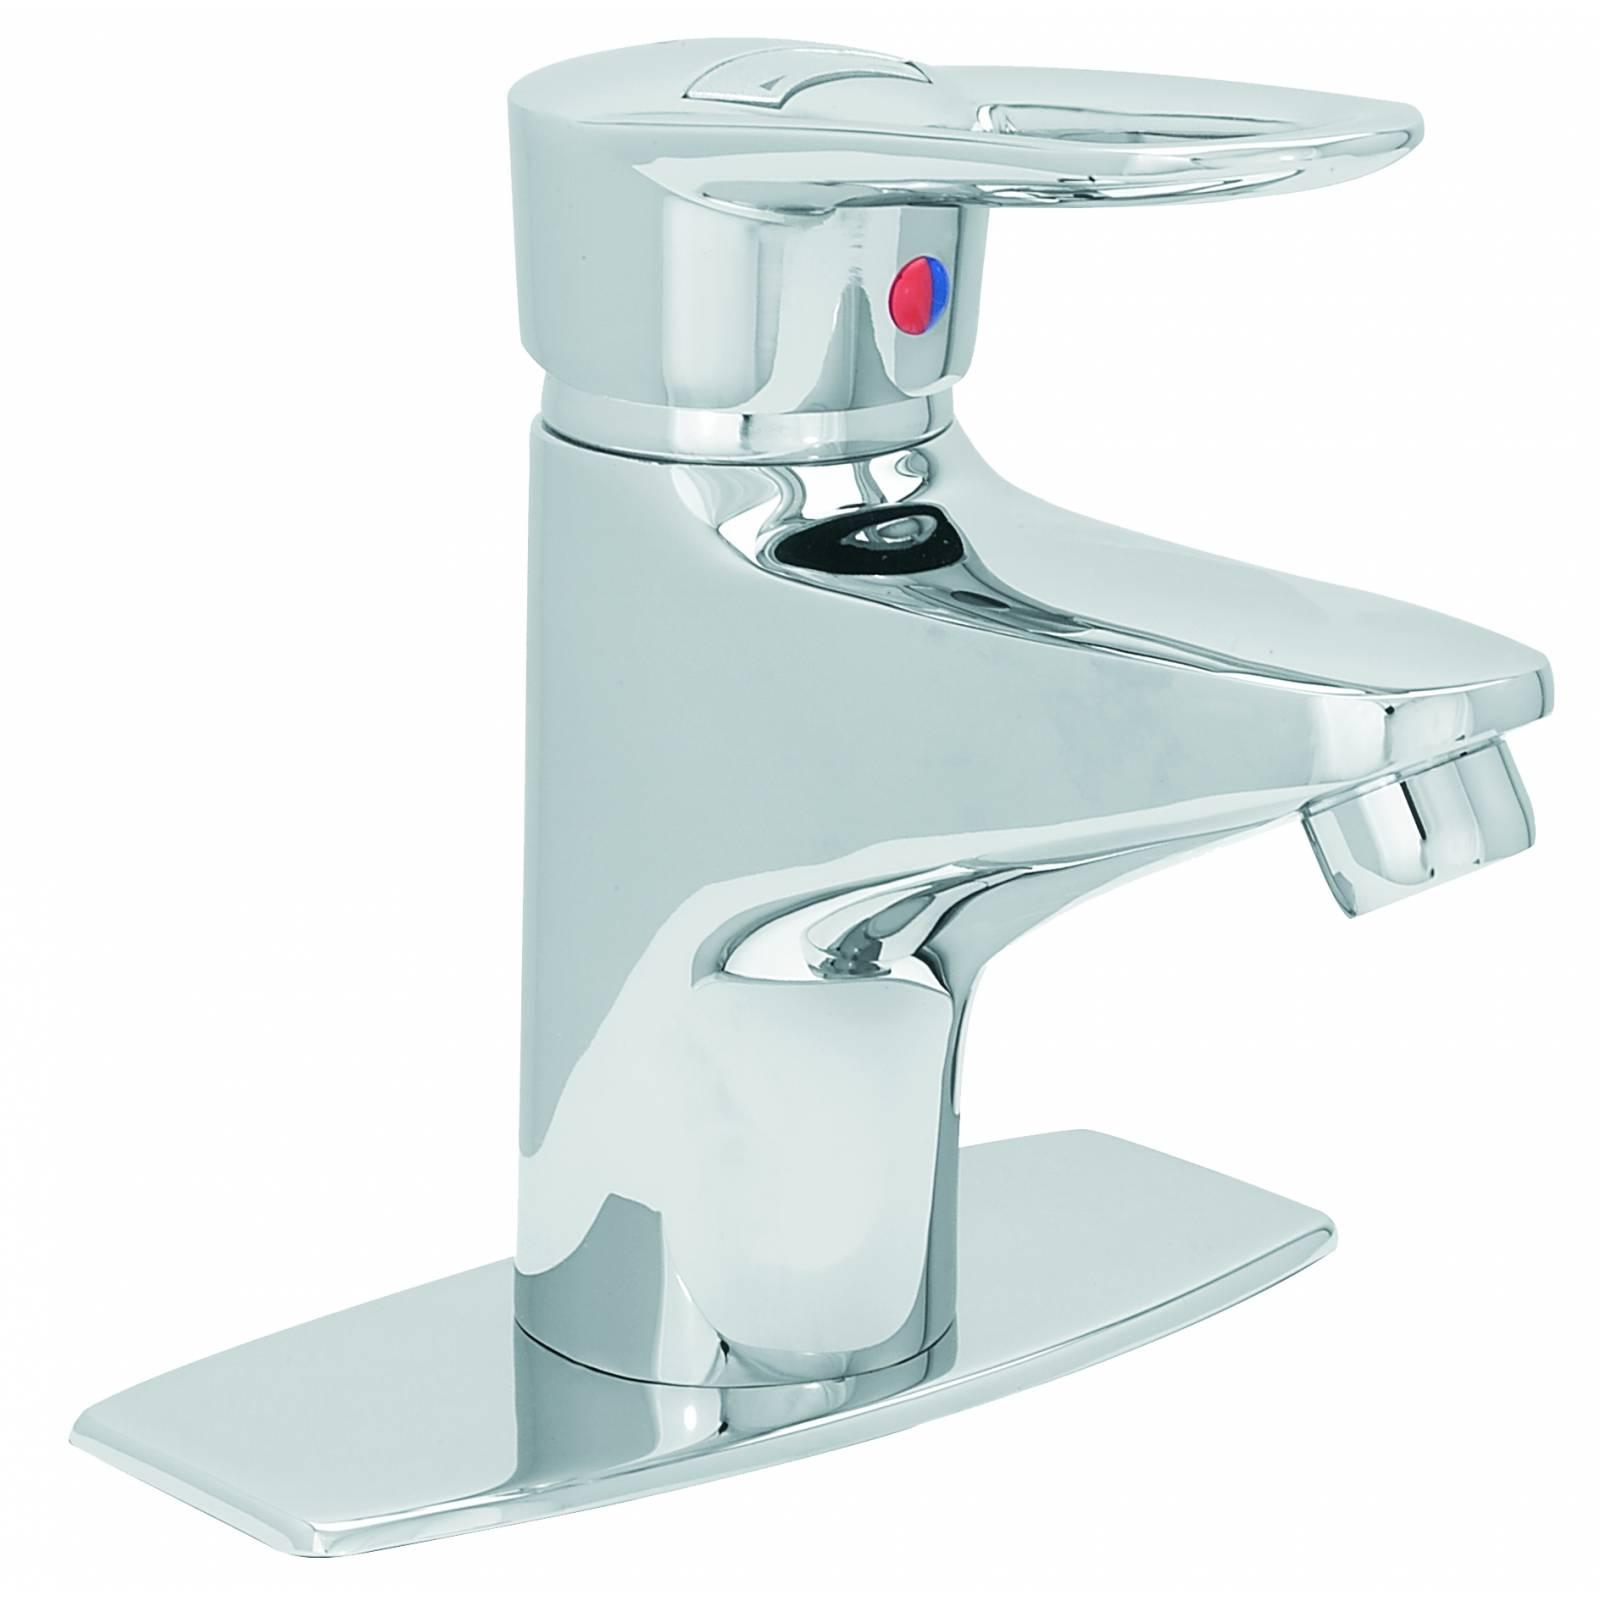 Monomando para lavabo corto 4421 DICA